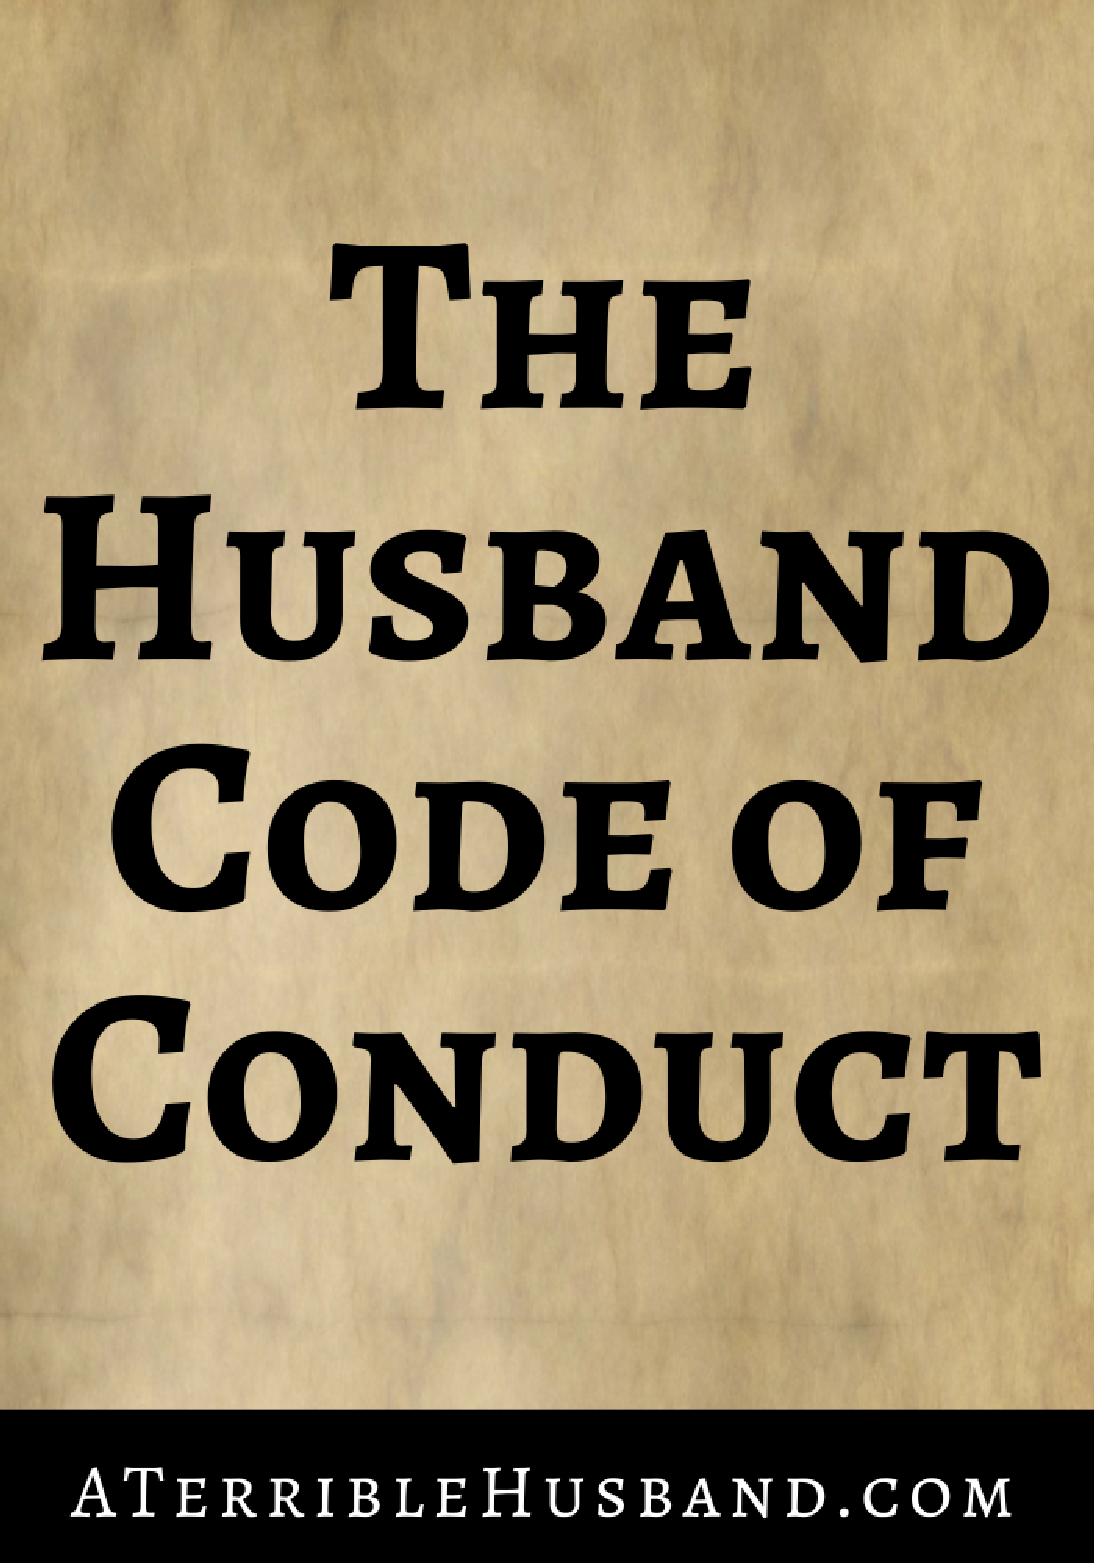 code of conduct mcdonalds